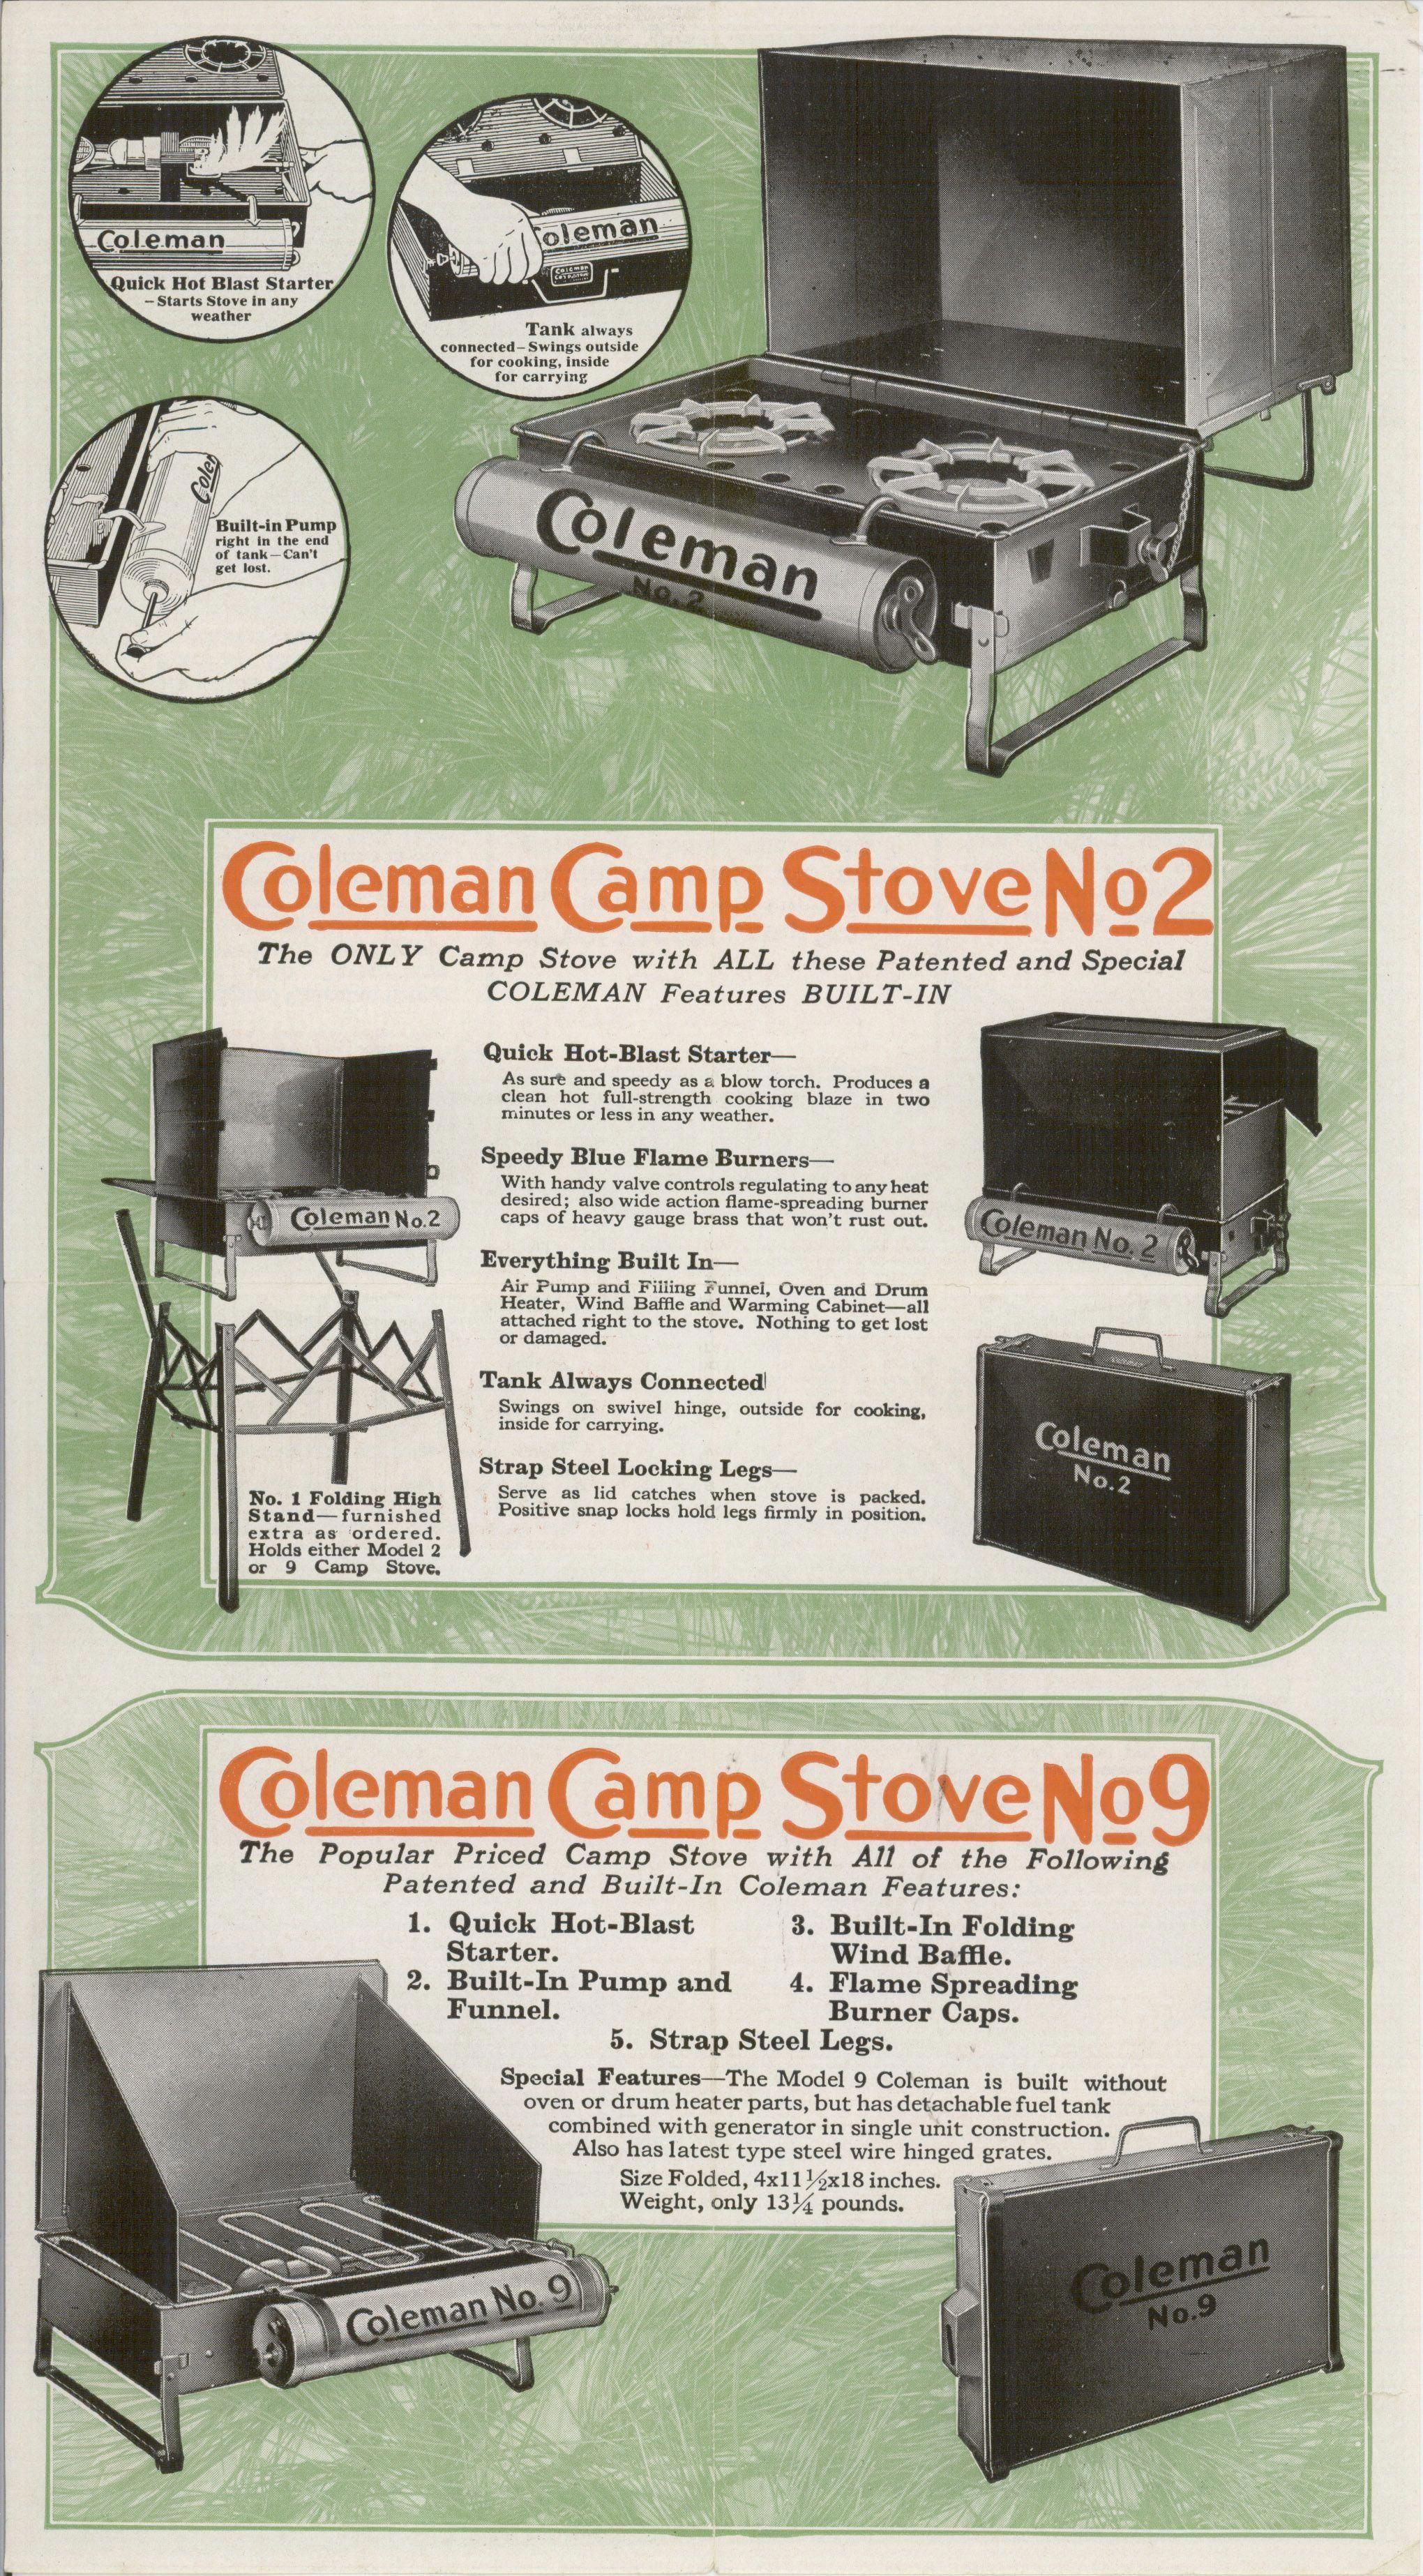 Santacruzcamping Camping Stove Best Camping Stove Coleman